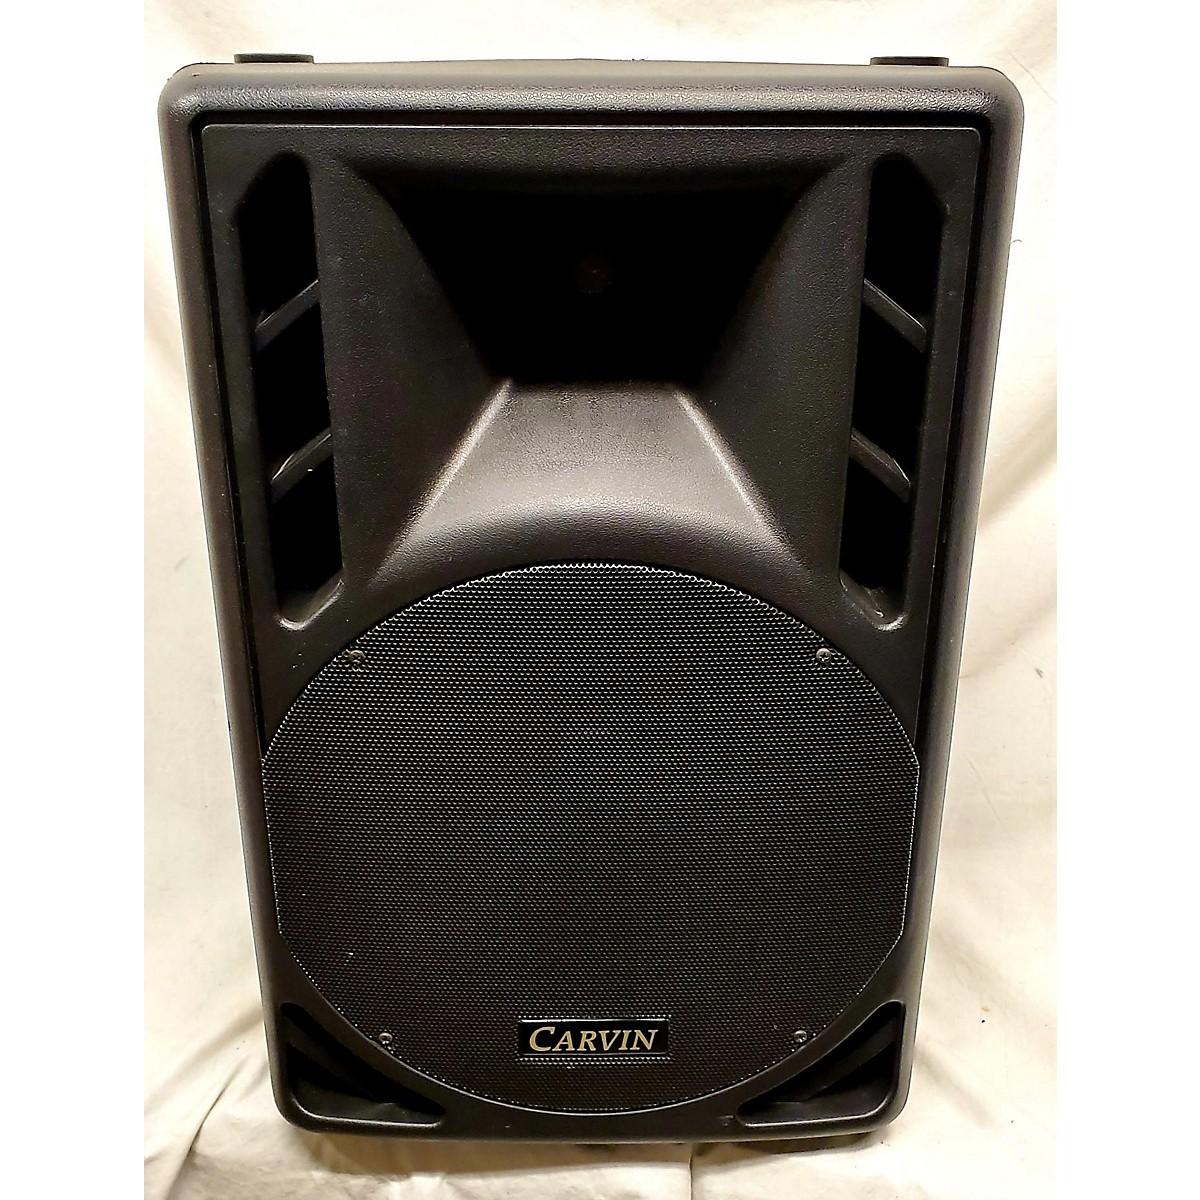 Carvin Passive LM12 Unpowered Speaker